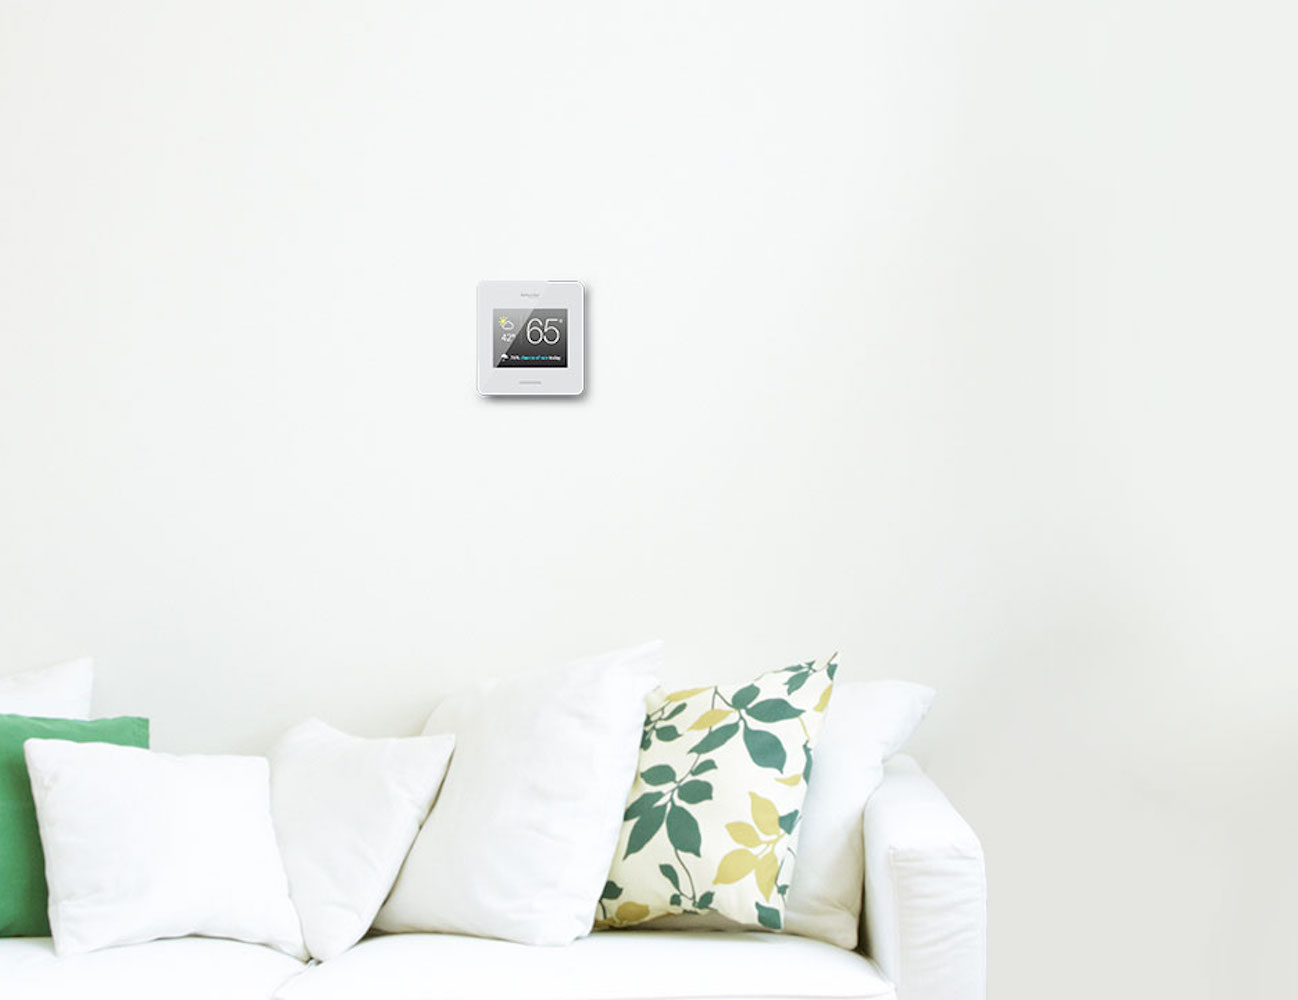 wiser-air-smart-thermostat-by-schneider-electric-04